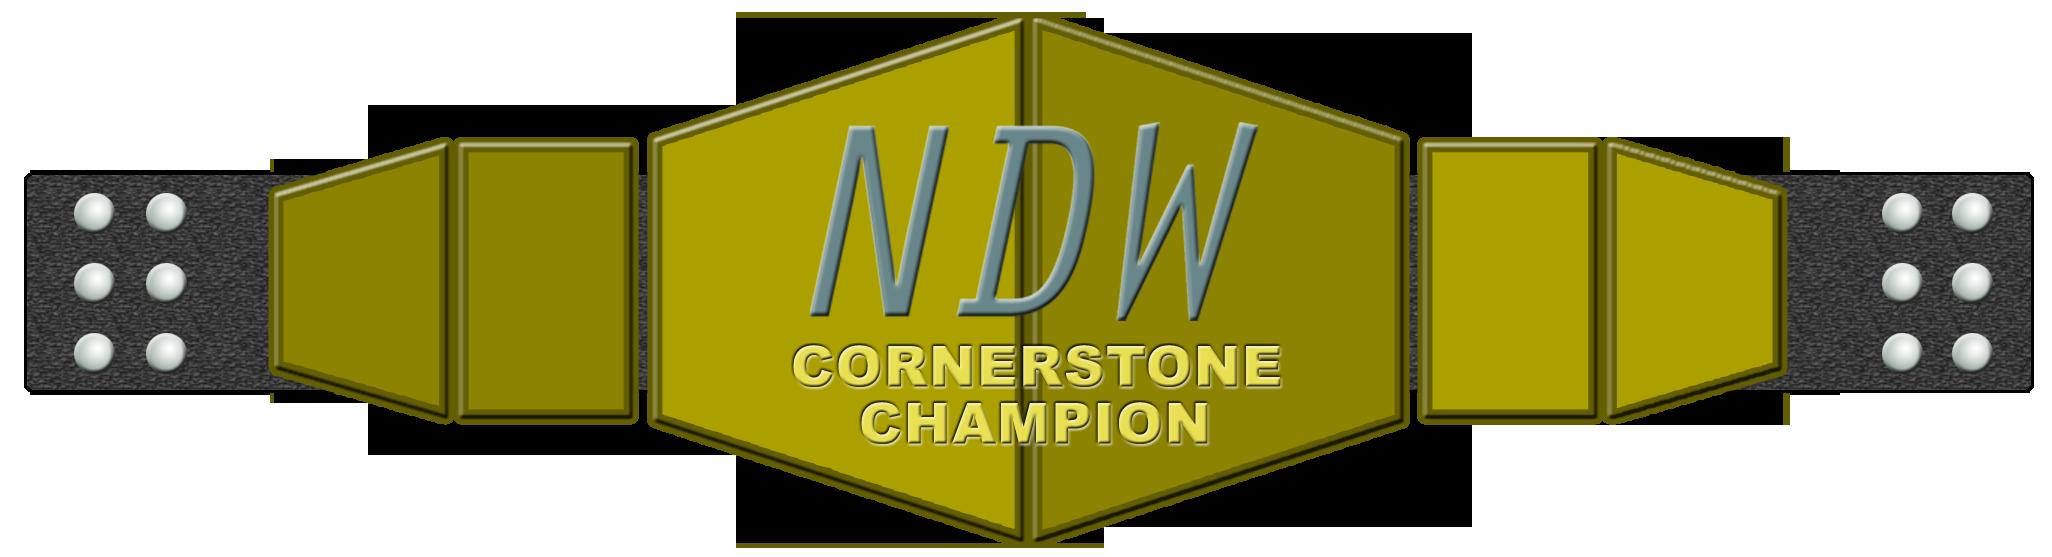 NDW Cornerstone Champion